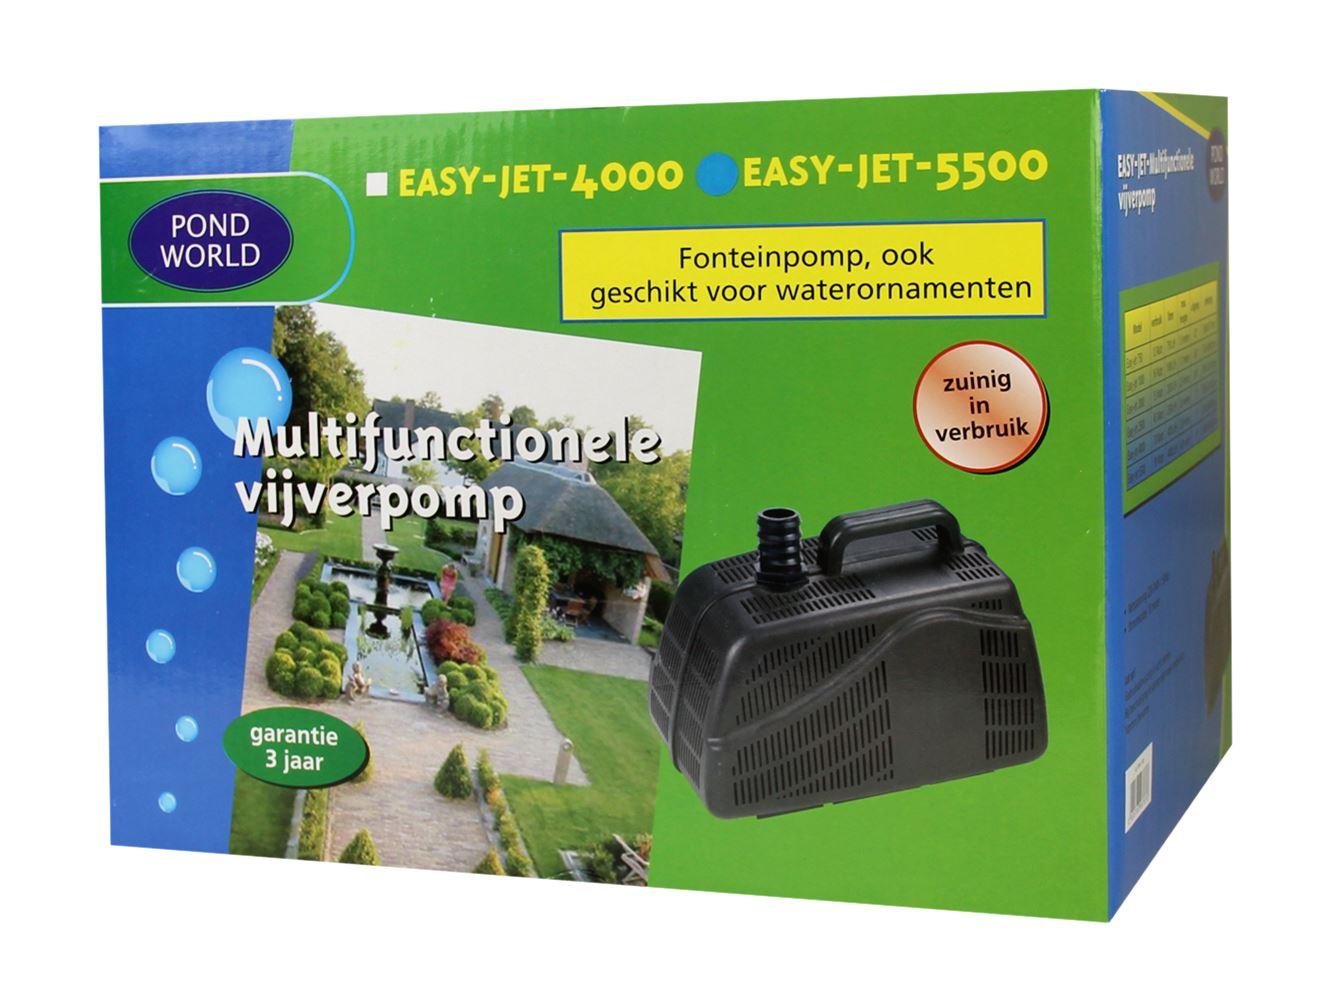 vijverpomp-pond-world-easy-jet-5500